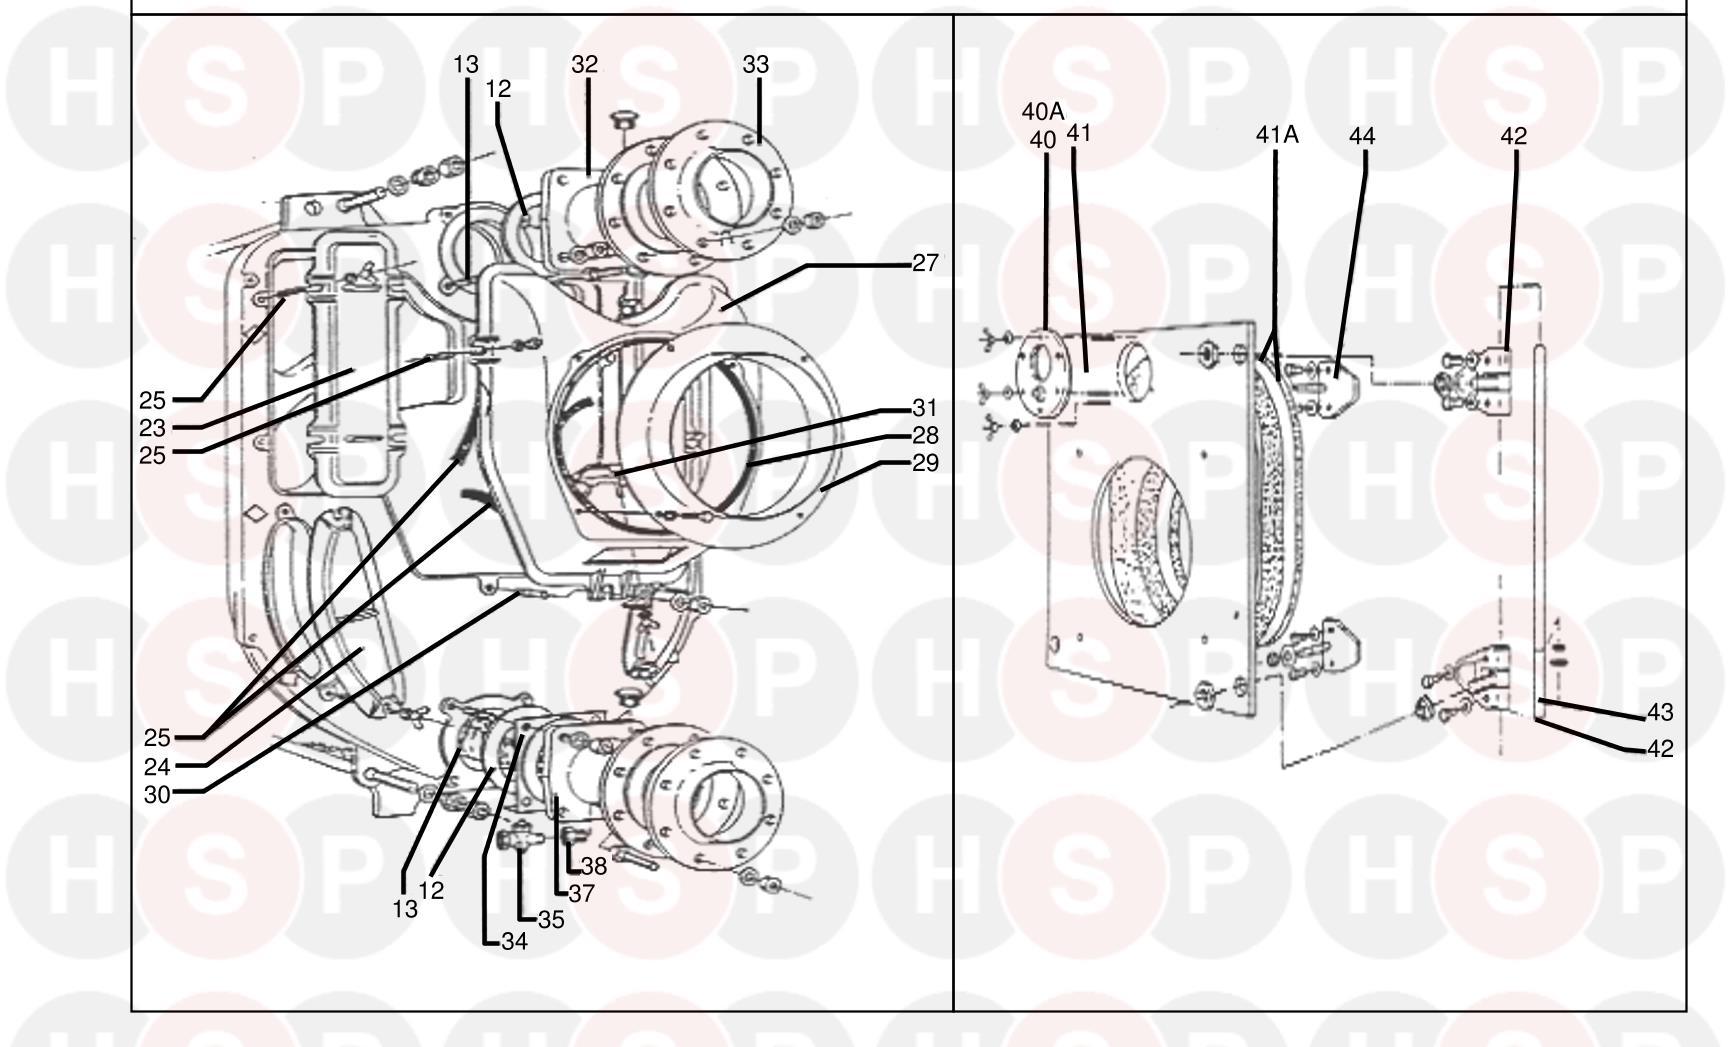 Potterton NXR4 9-17 Section (BOILER COMPONENTS 2) Diagram